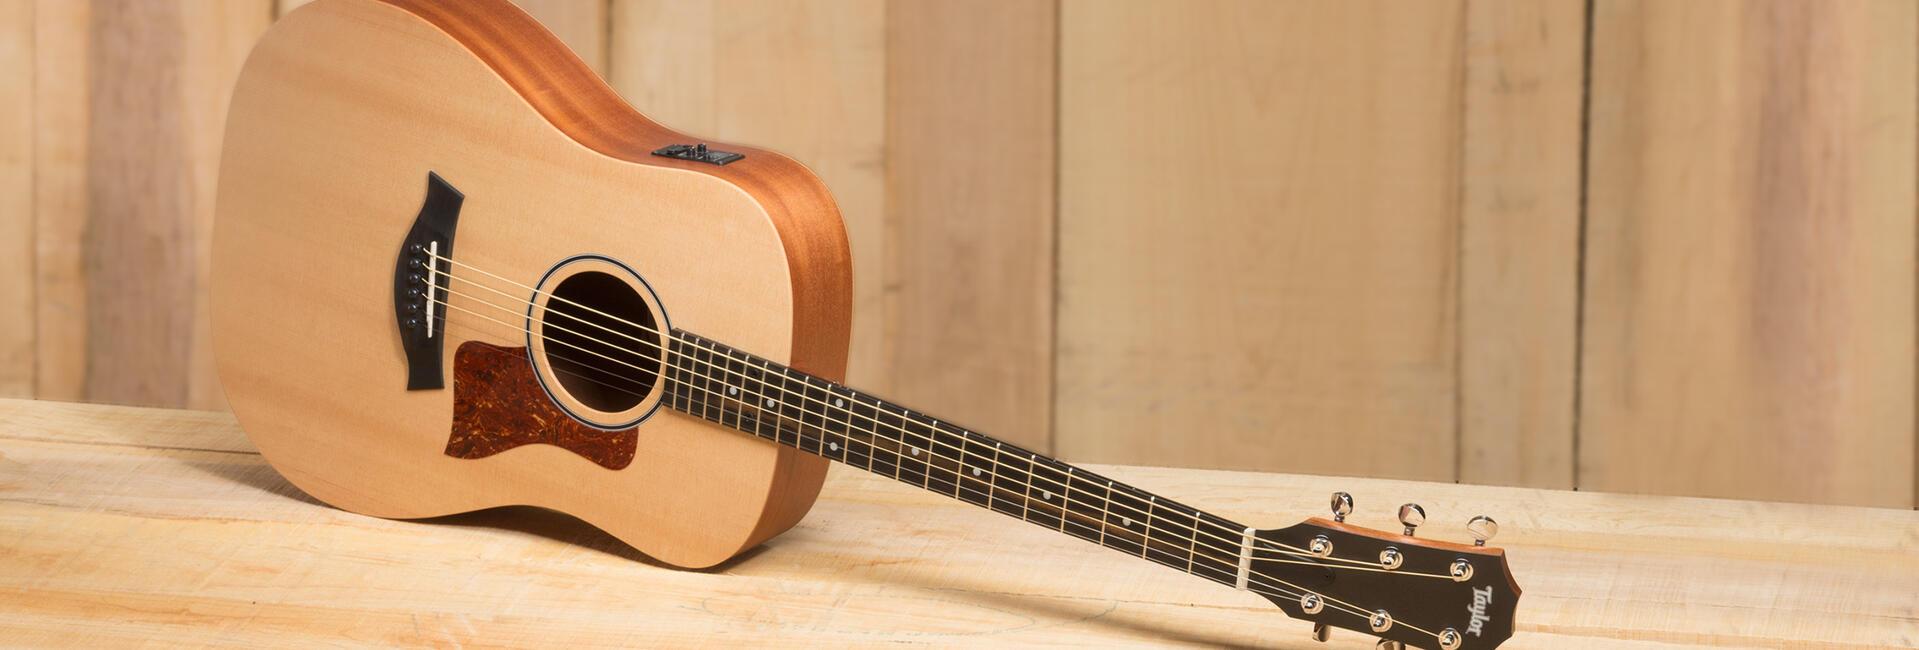 Big Baby Series Taylor Guitars